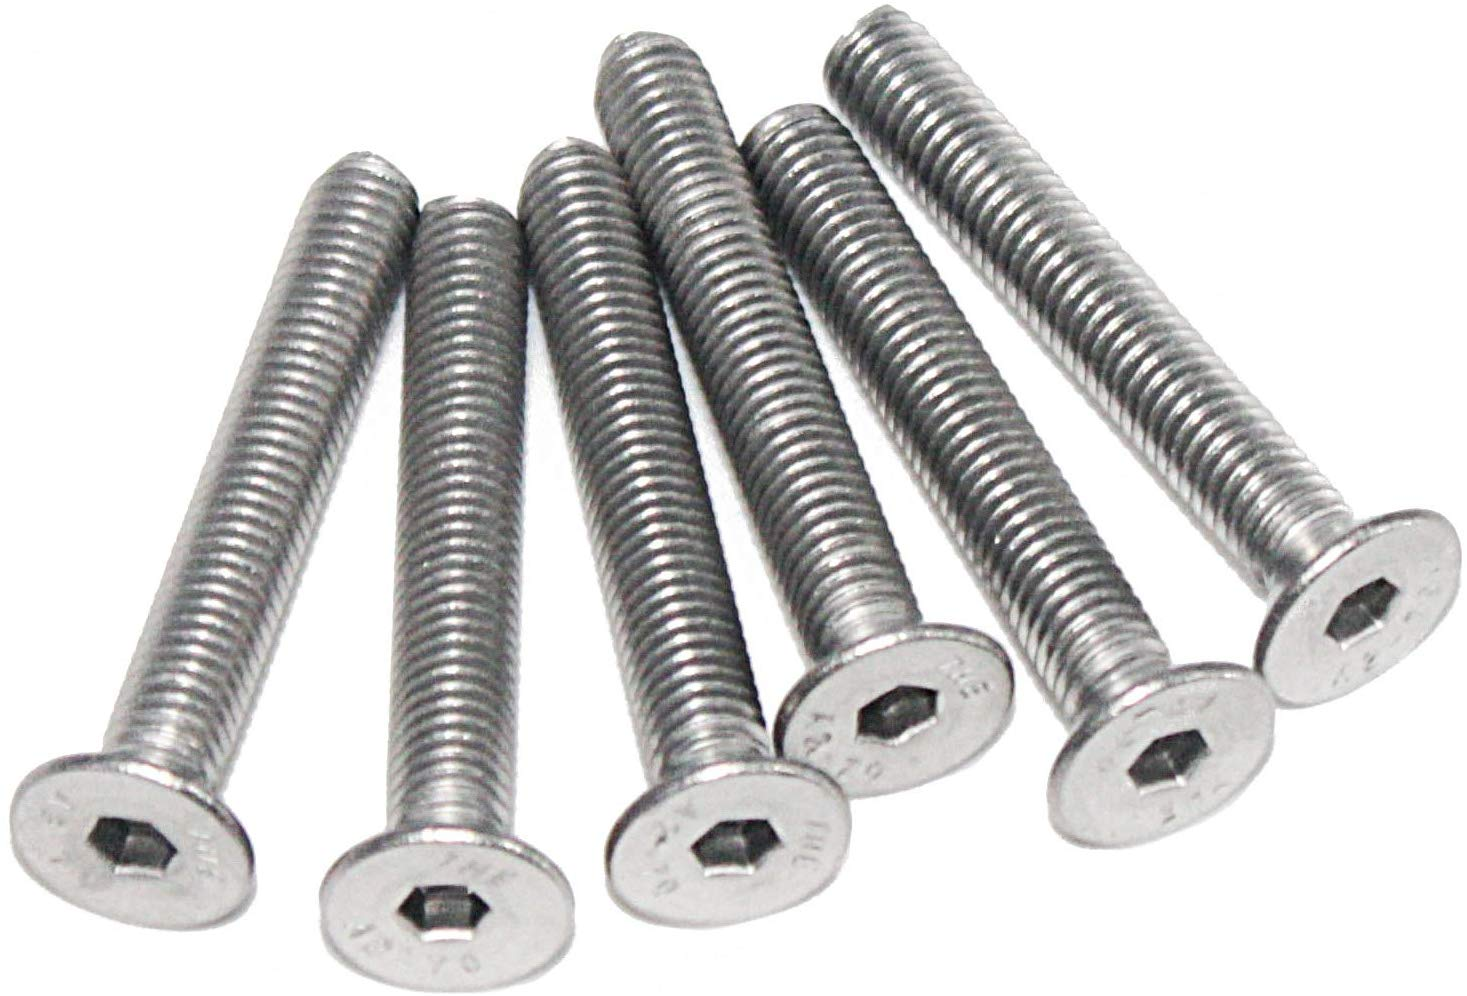 Fullerkreg 18-8 Stainless Steel Hex Drive Flat Head Screw M6 x 1 mm Thread 65 mm Long,Packs of 10